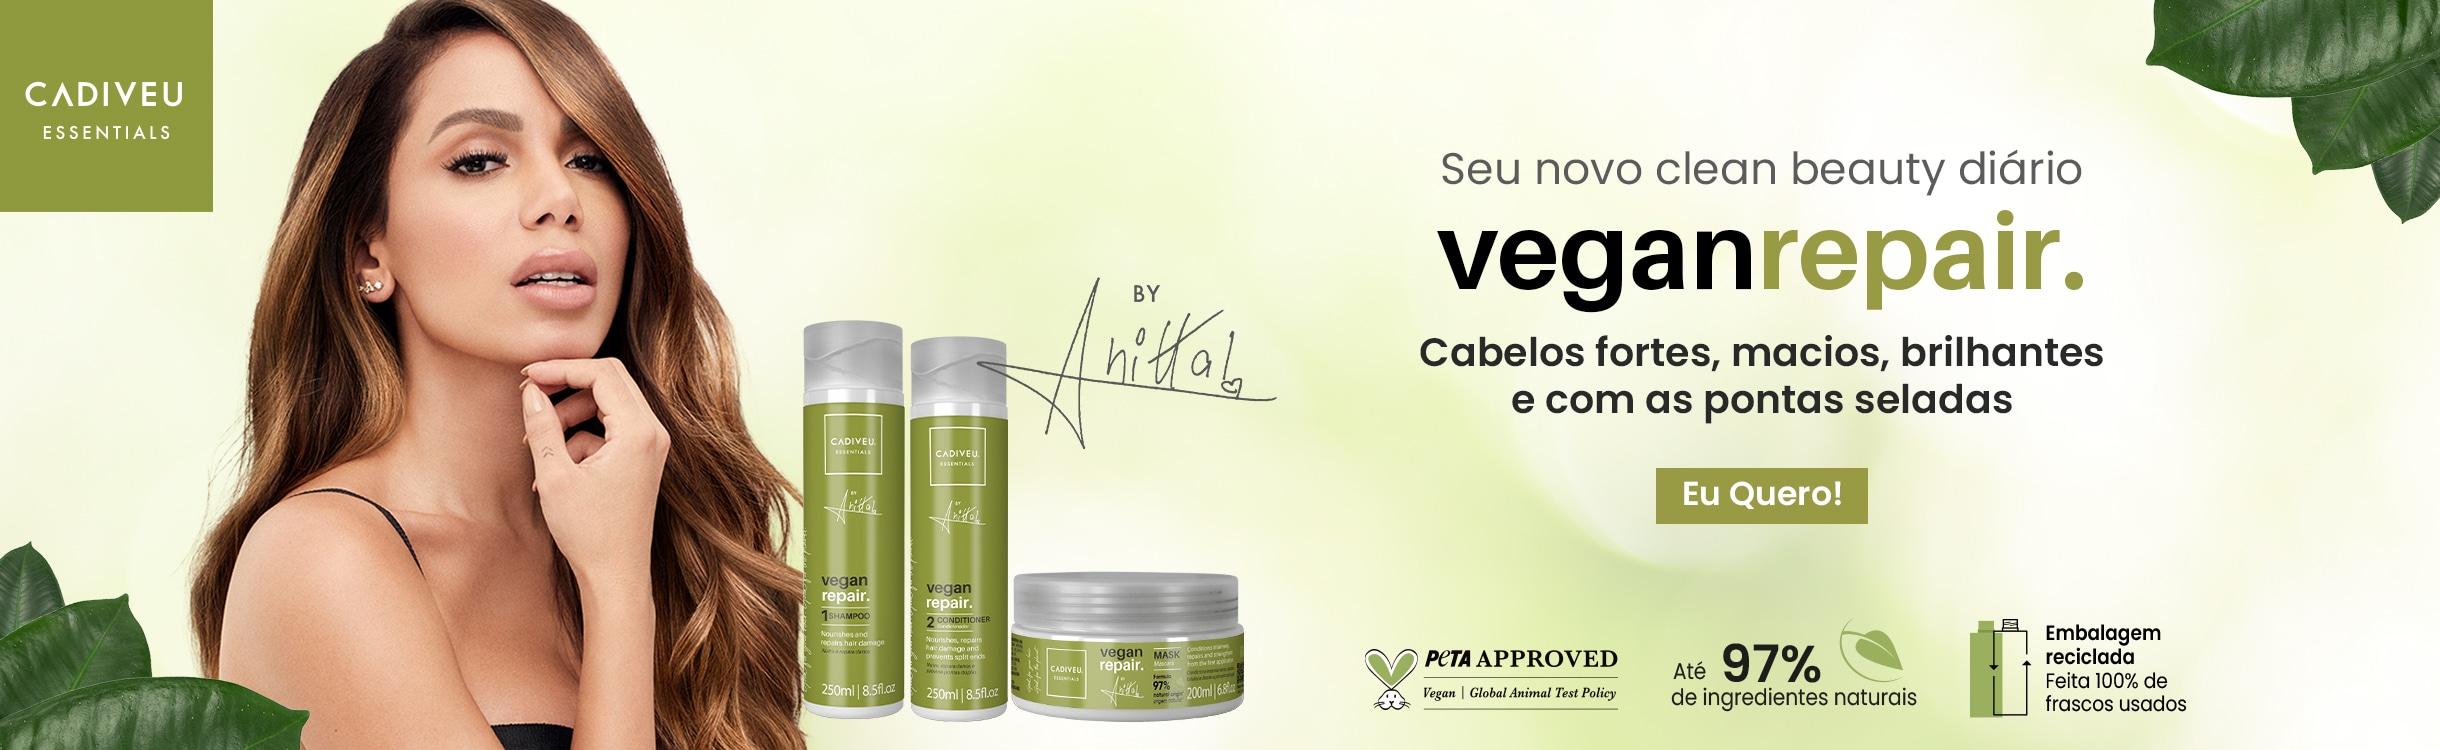 Cadiveu Professional Essentials Vegan Repair by Anitta